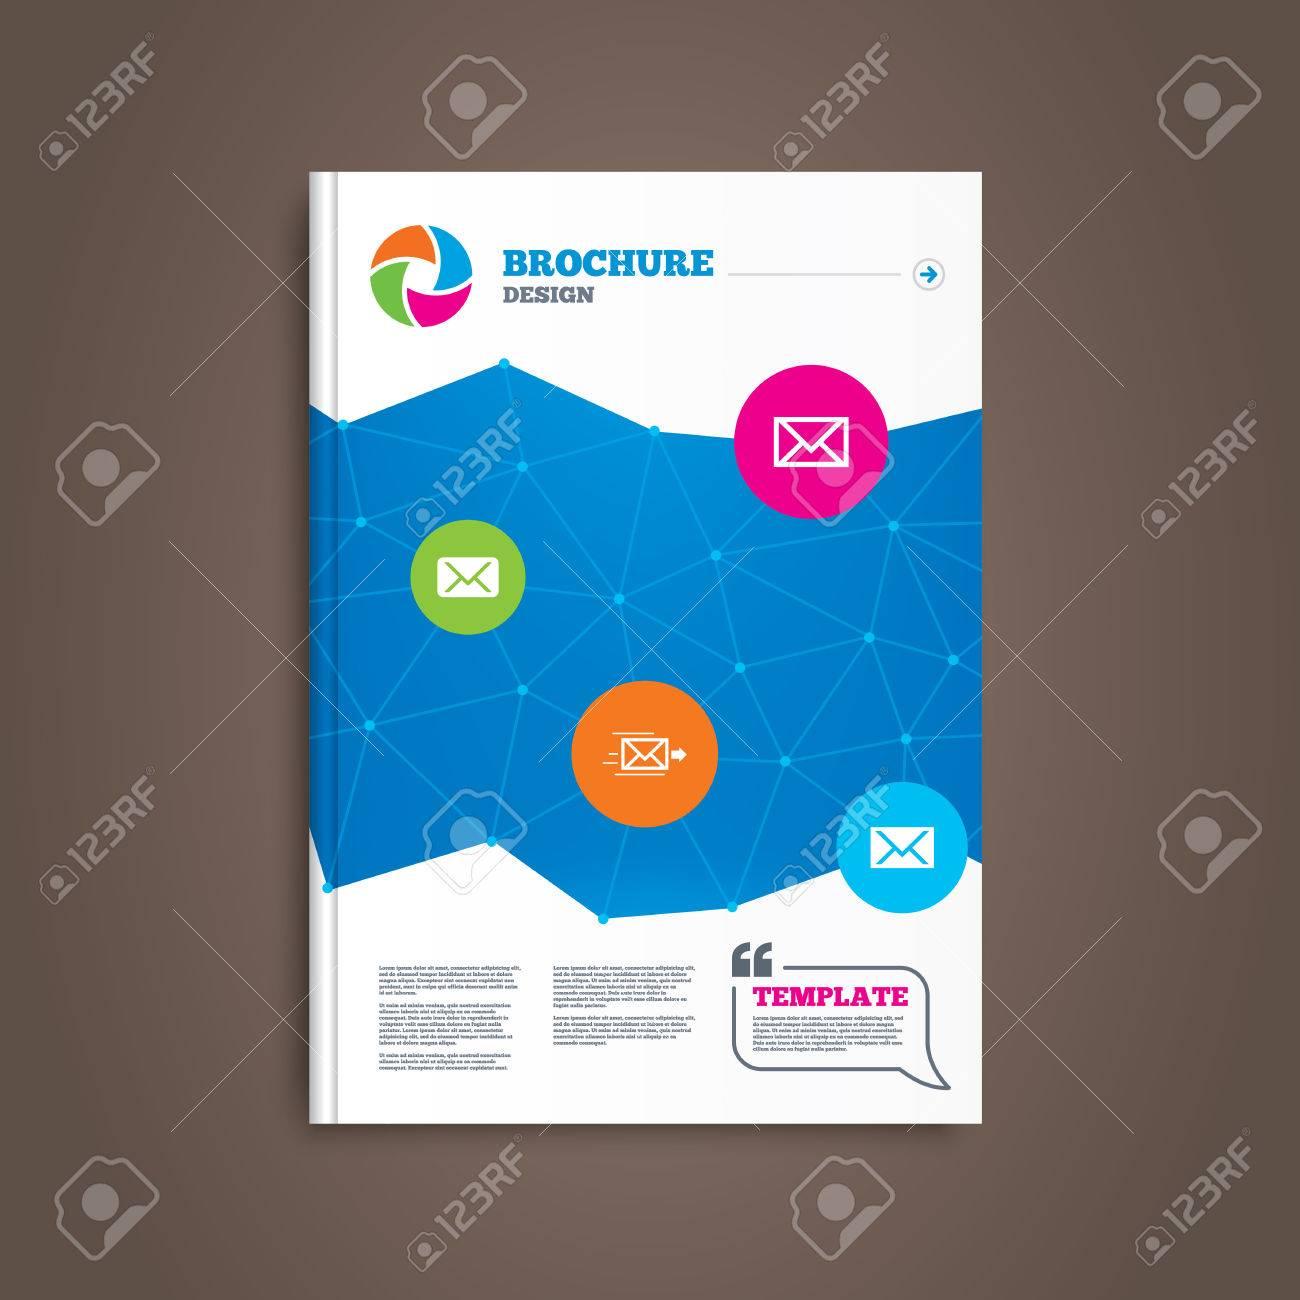 brochure or flyer design mail envelope icons message delivery